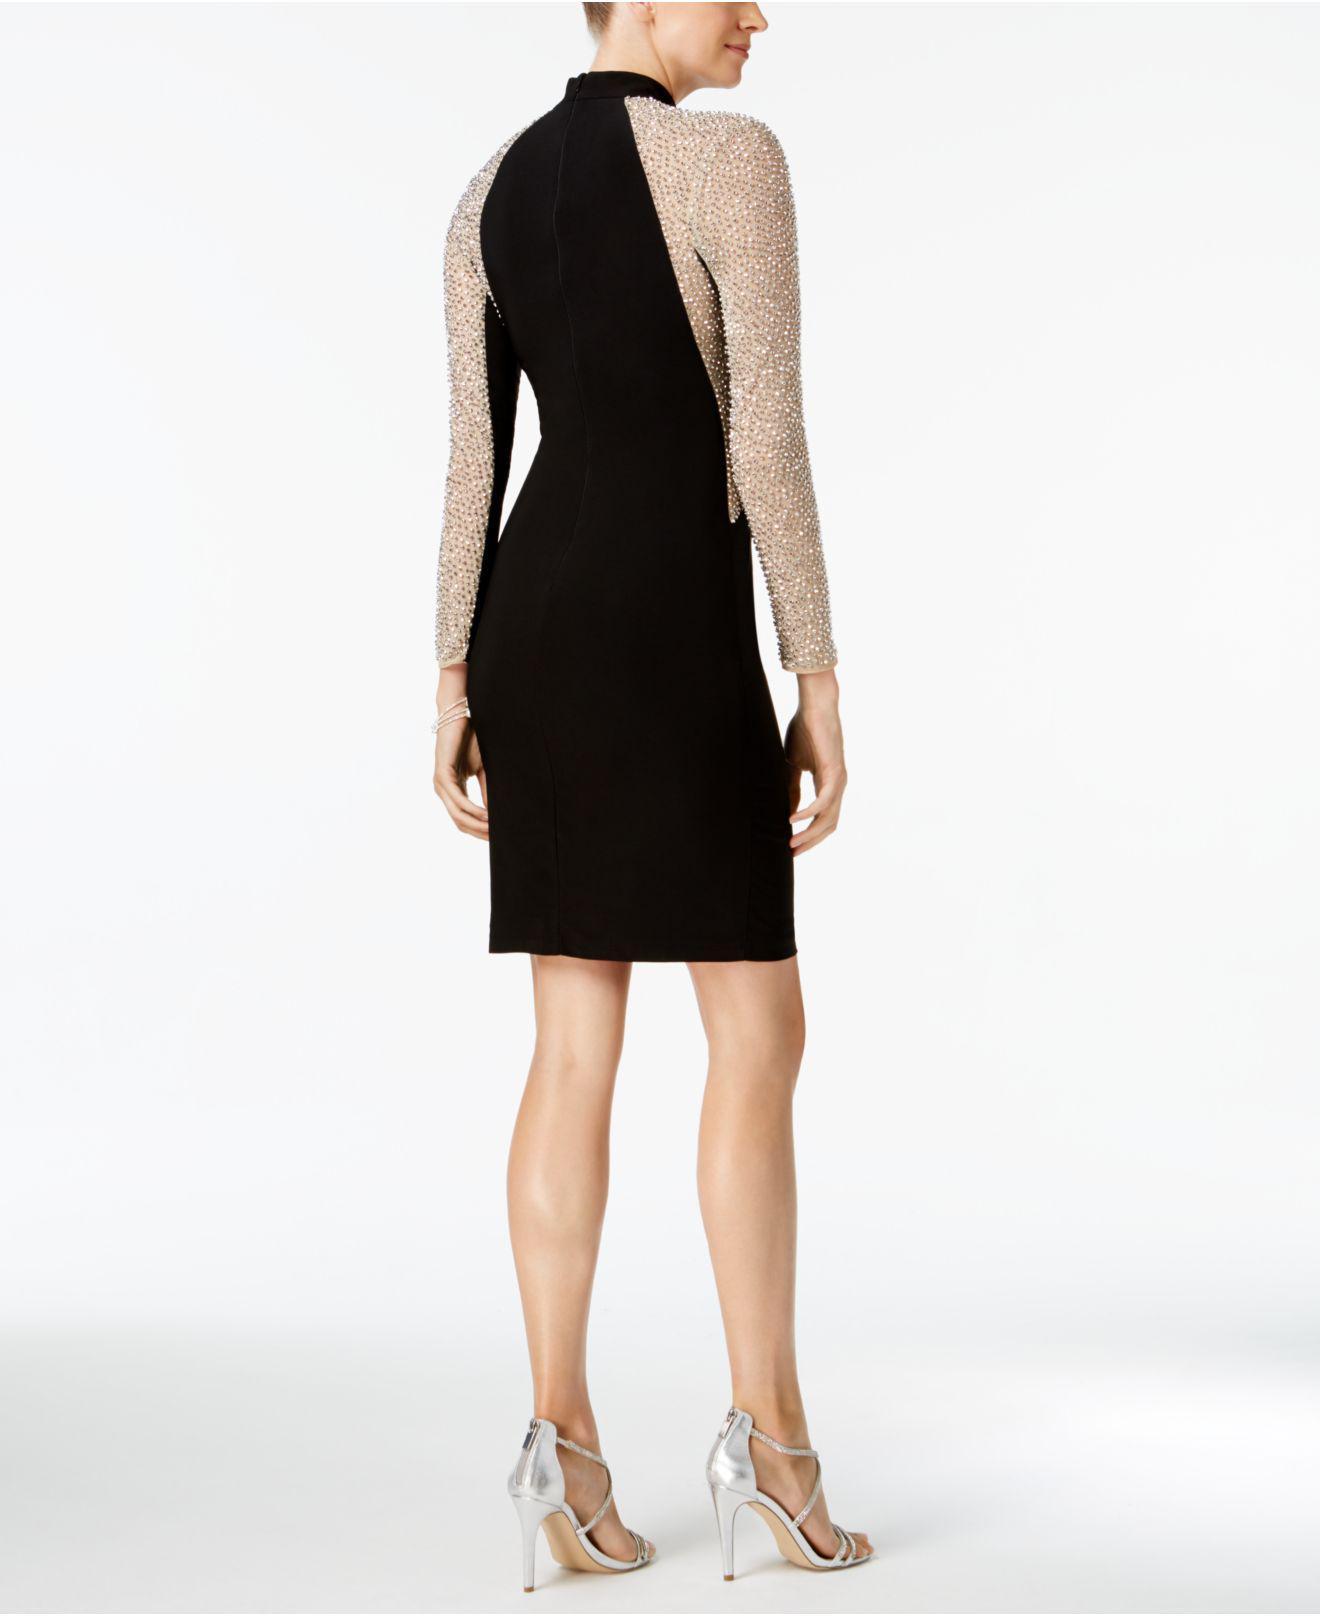 89de46bc385 Lyst - Xscape Studded Illusion Choker Sheath Dress in Black